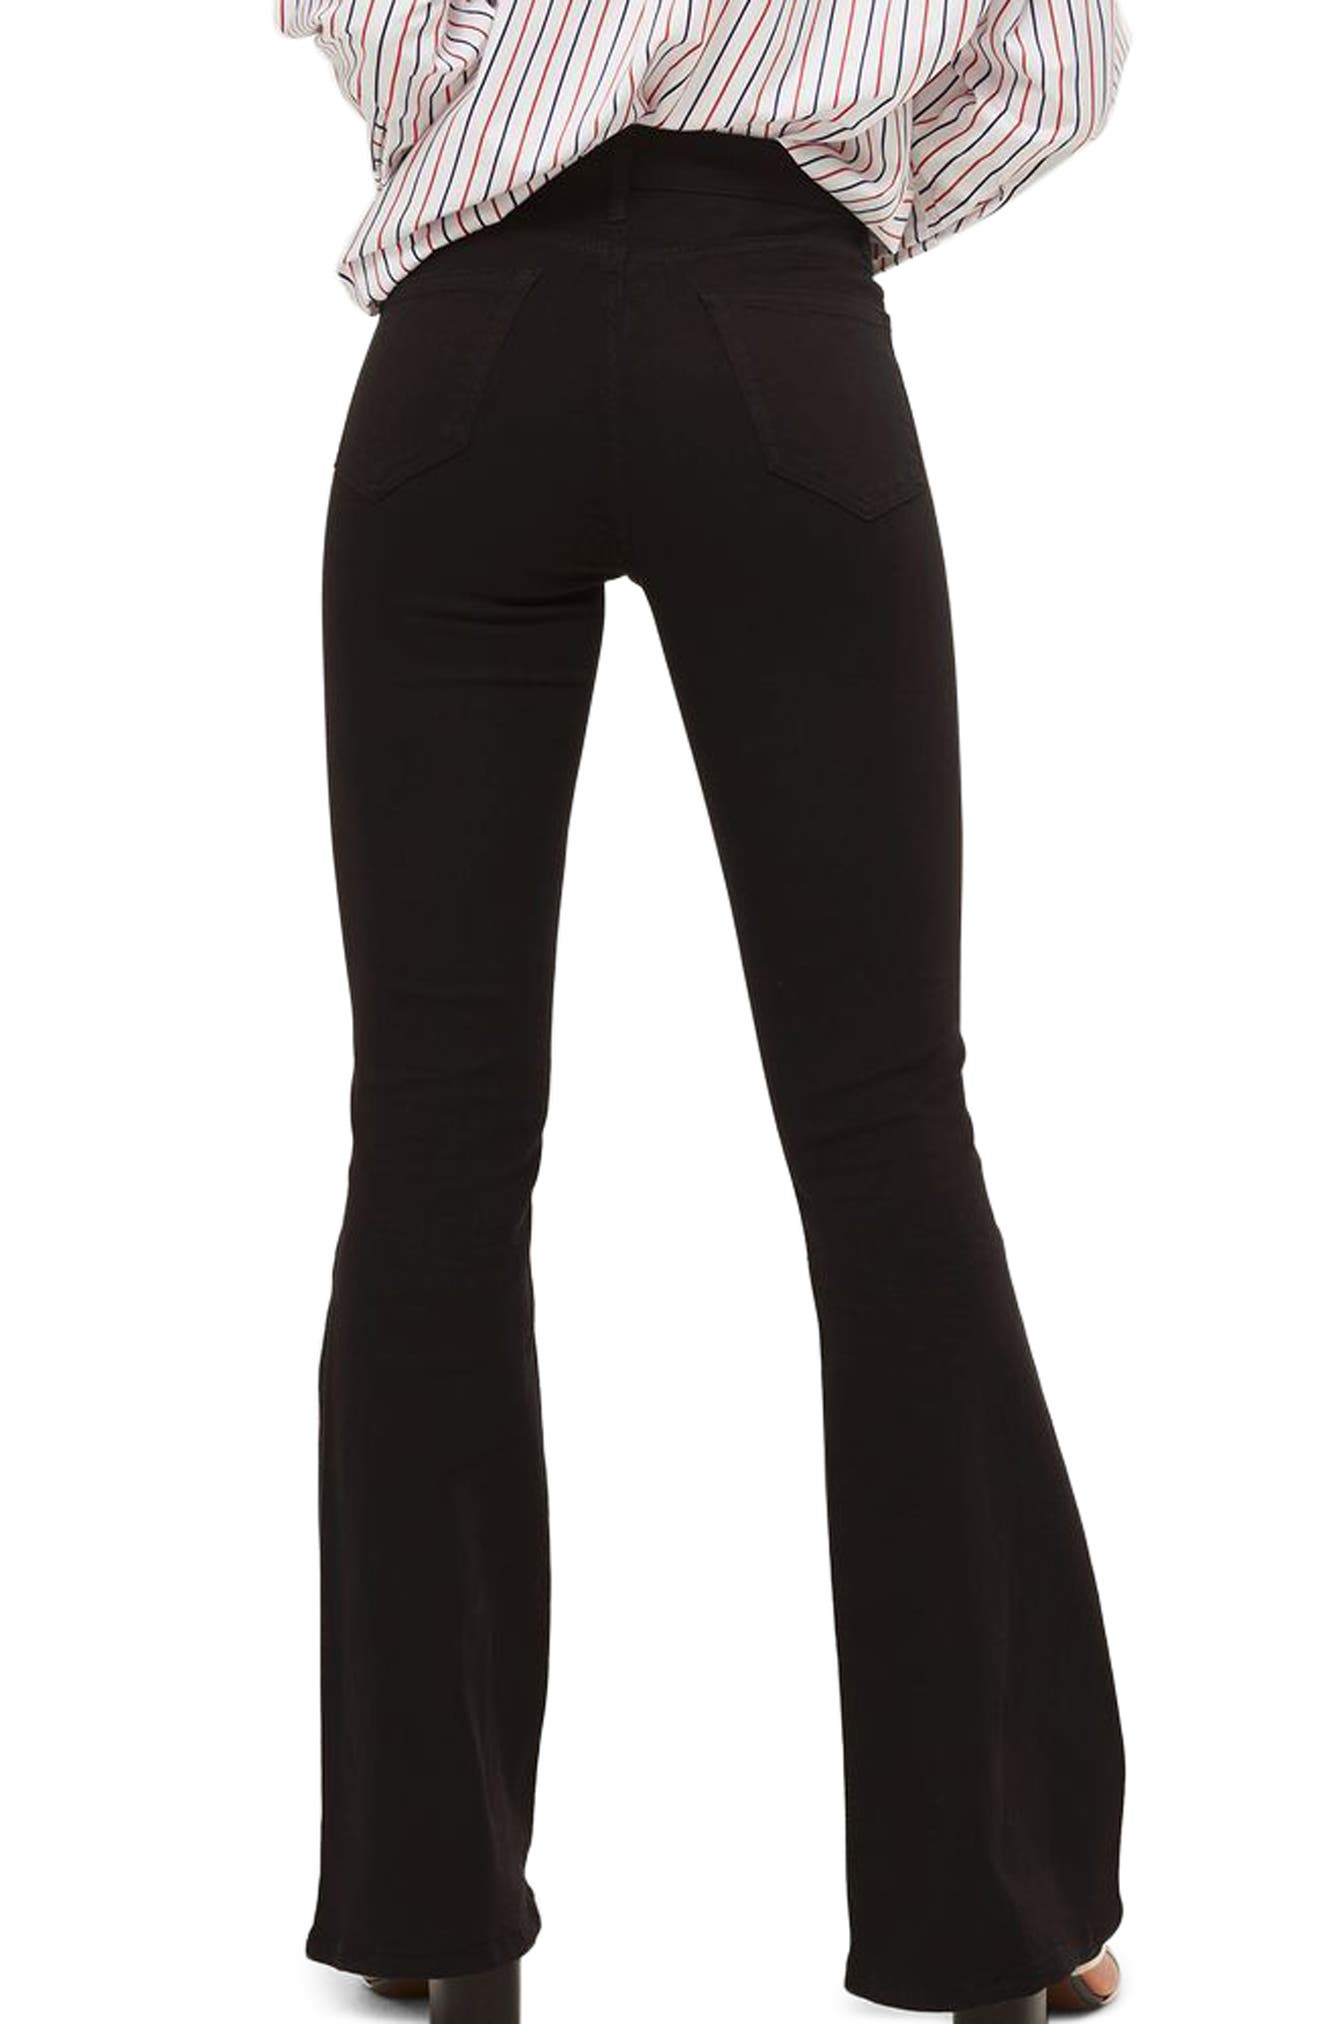 Jamie High Waist Flare Jeans,                             Alternate thumbnail 3, color,                             Black